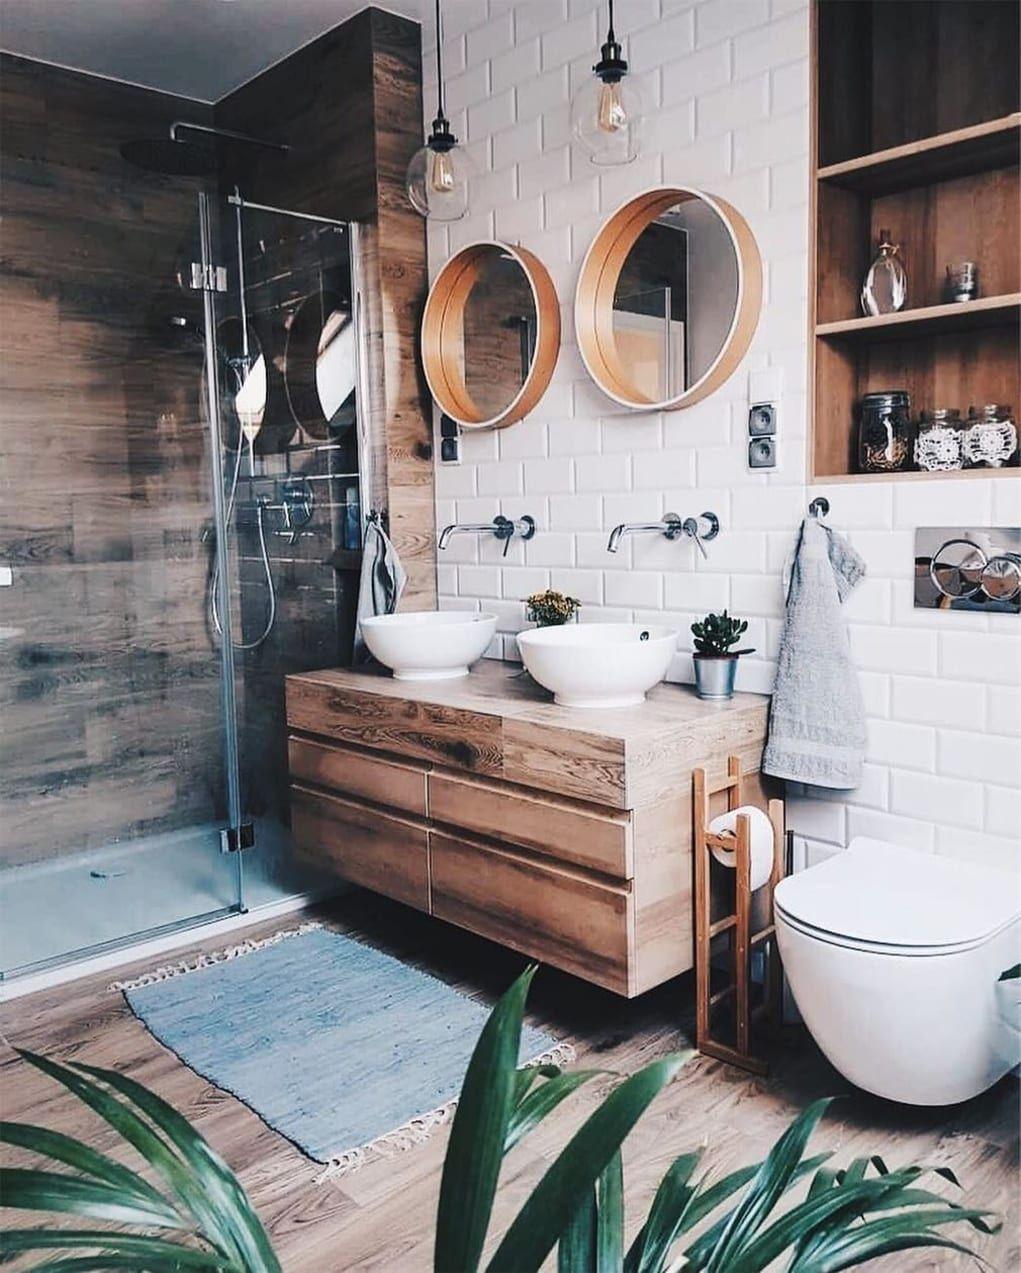 Minimal Interior Design Inspiration 169 Bright Bathroom Trendy Bathroom Bathroom Inspiration Small bathroom bathroom design